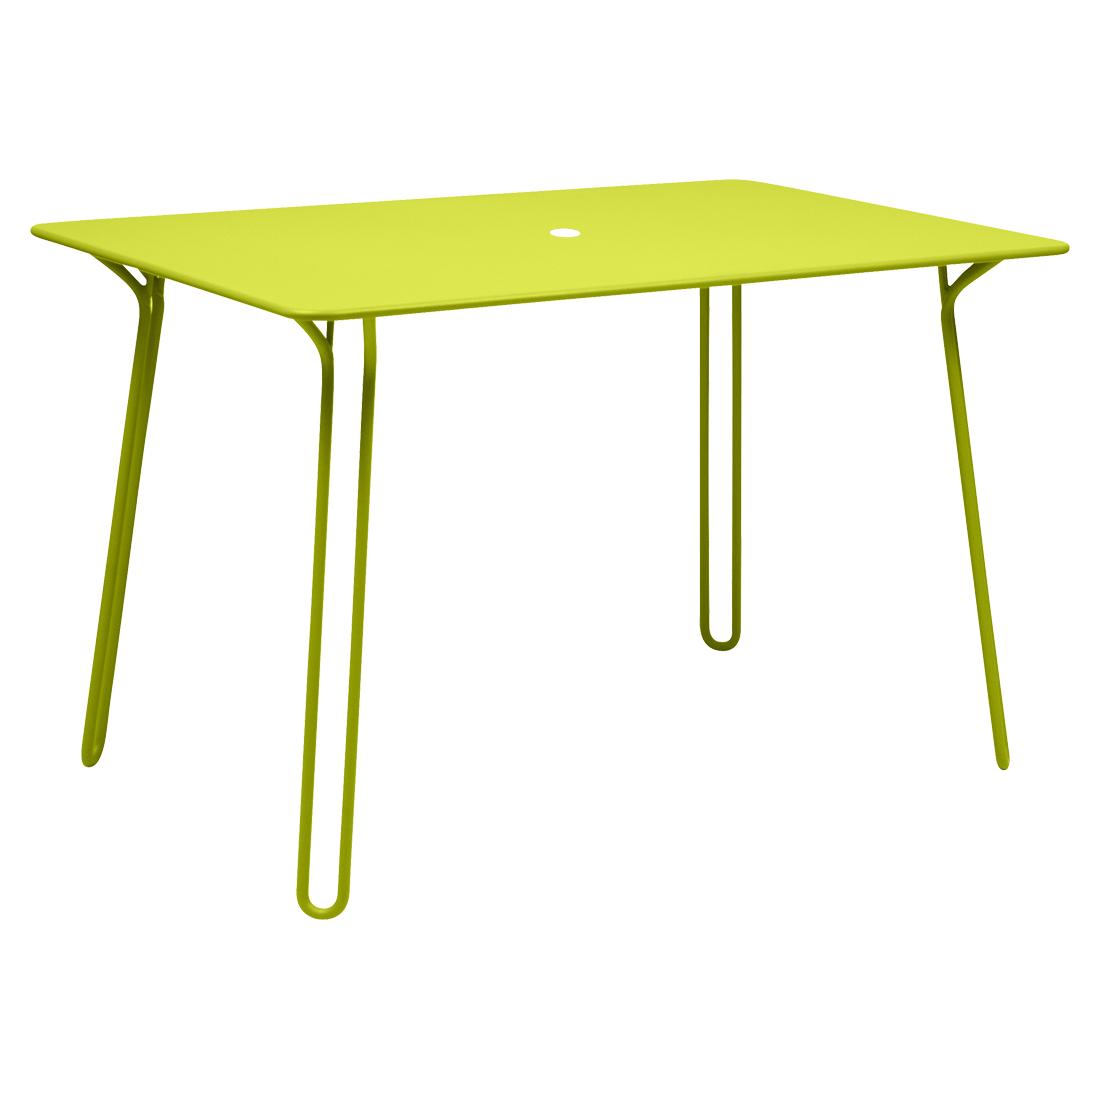 tavolo fermob surprising 120 x 77 fiorinmaurizio. Black Bedroom Furniture Sets. Home Design Ideas